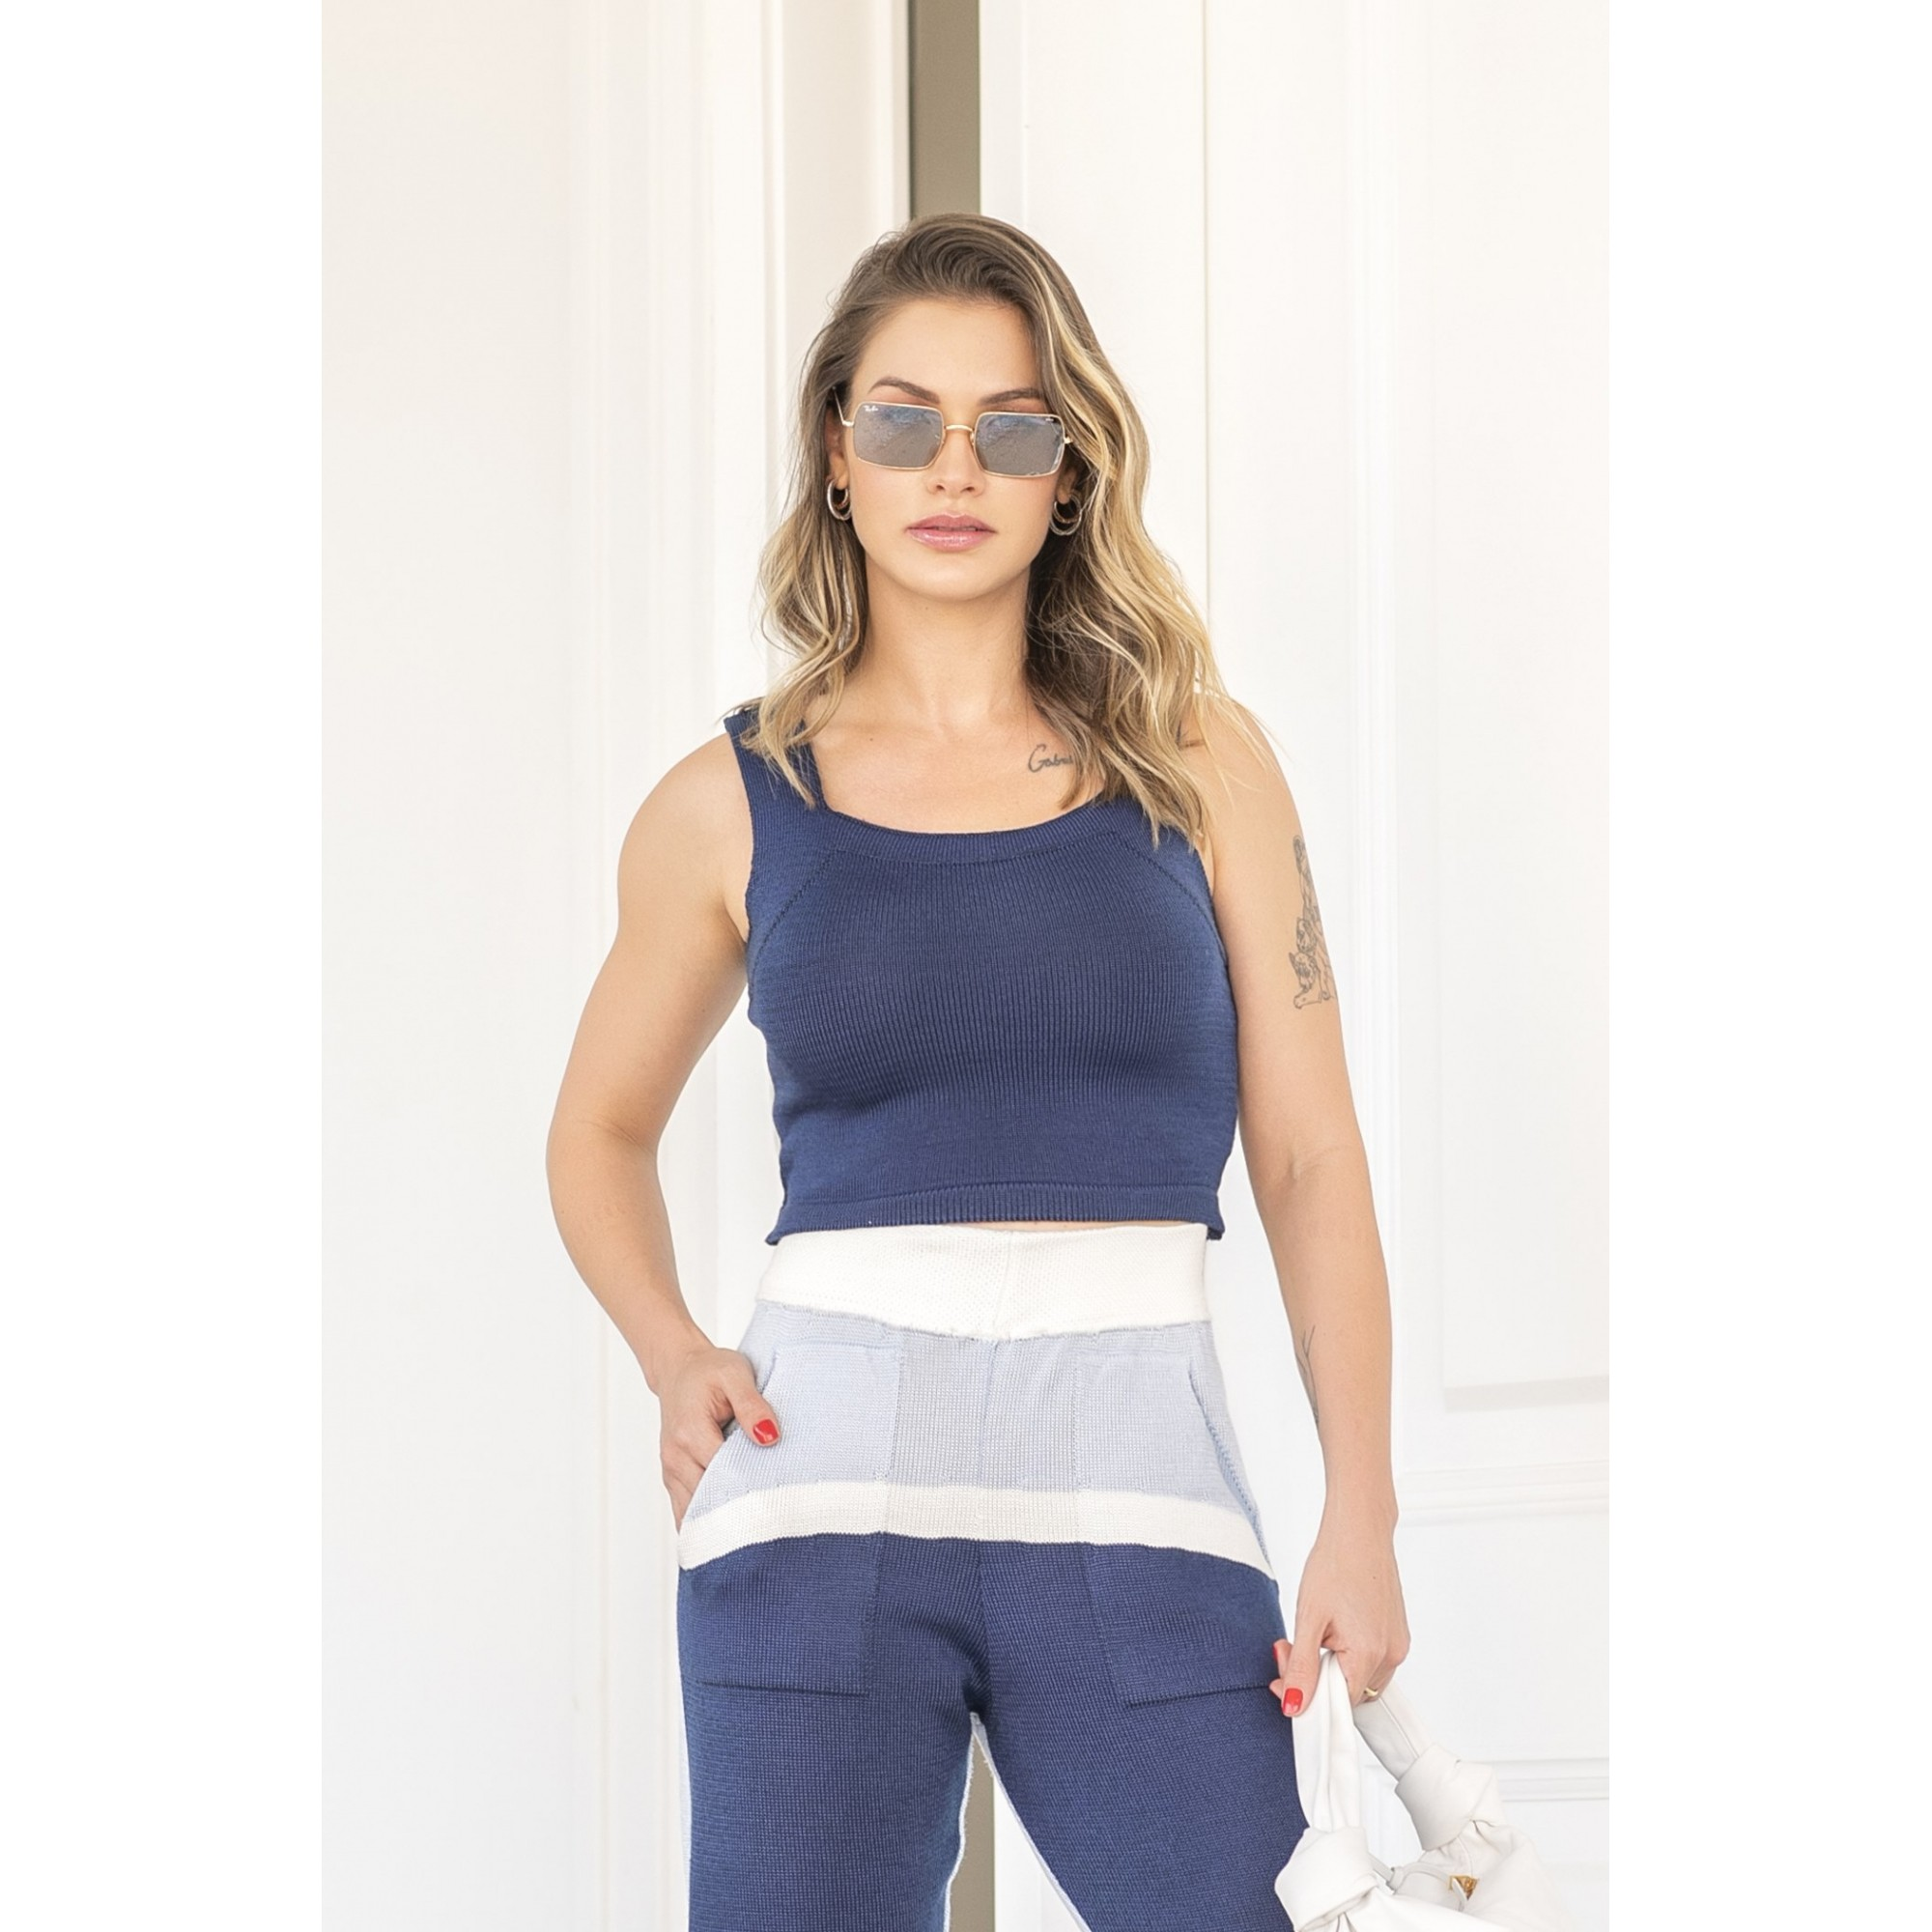 Conjunto Larissa Blusa Cropped + Calça Feminino Vera Tricot Azul Marinho